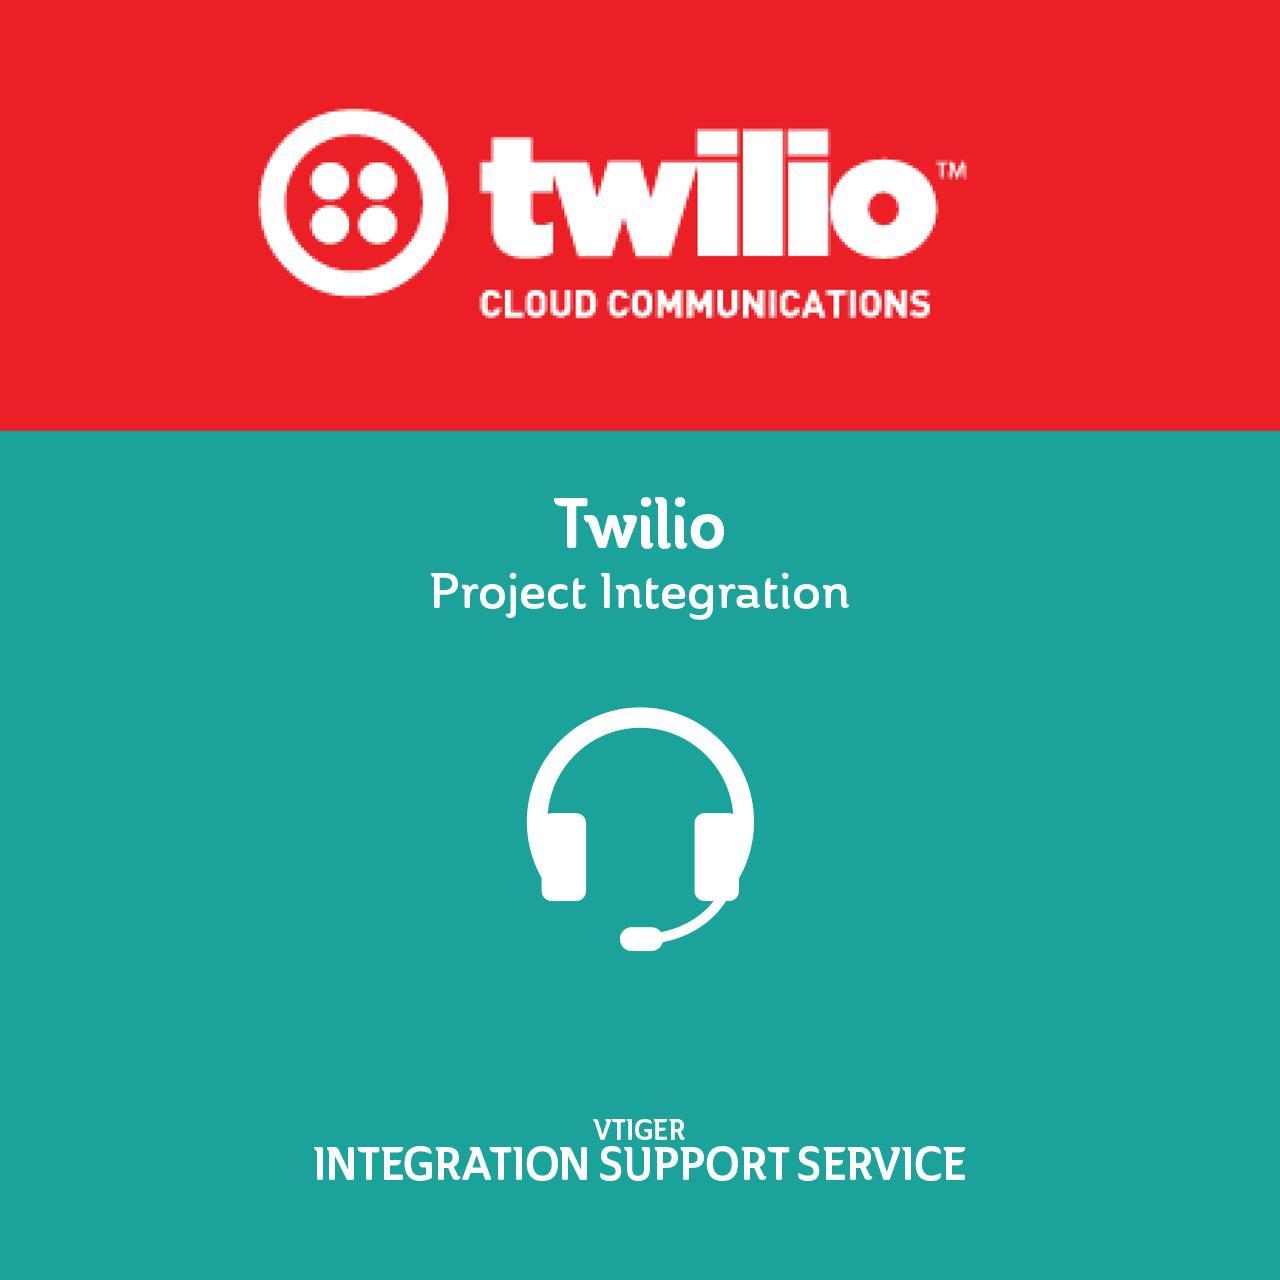 Twilio for VtigerCRM by crmeye on Envato Studio